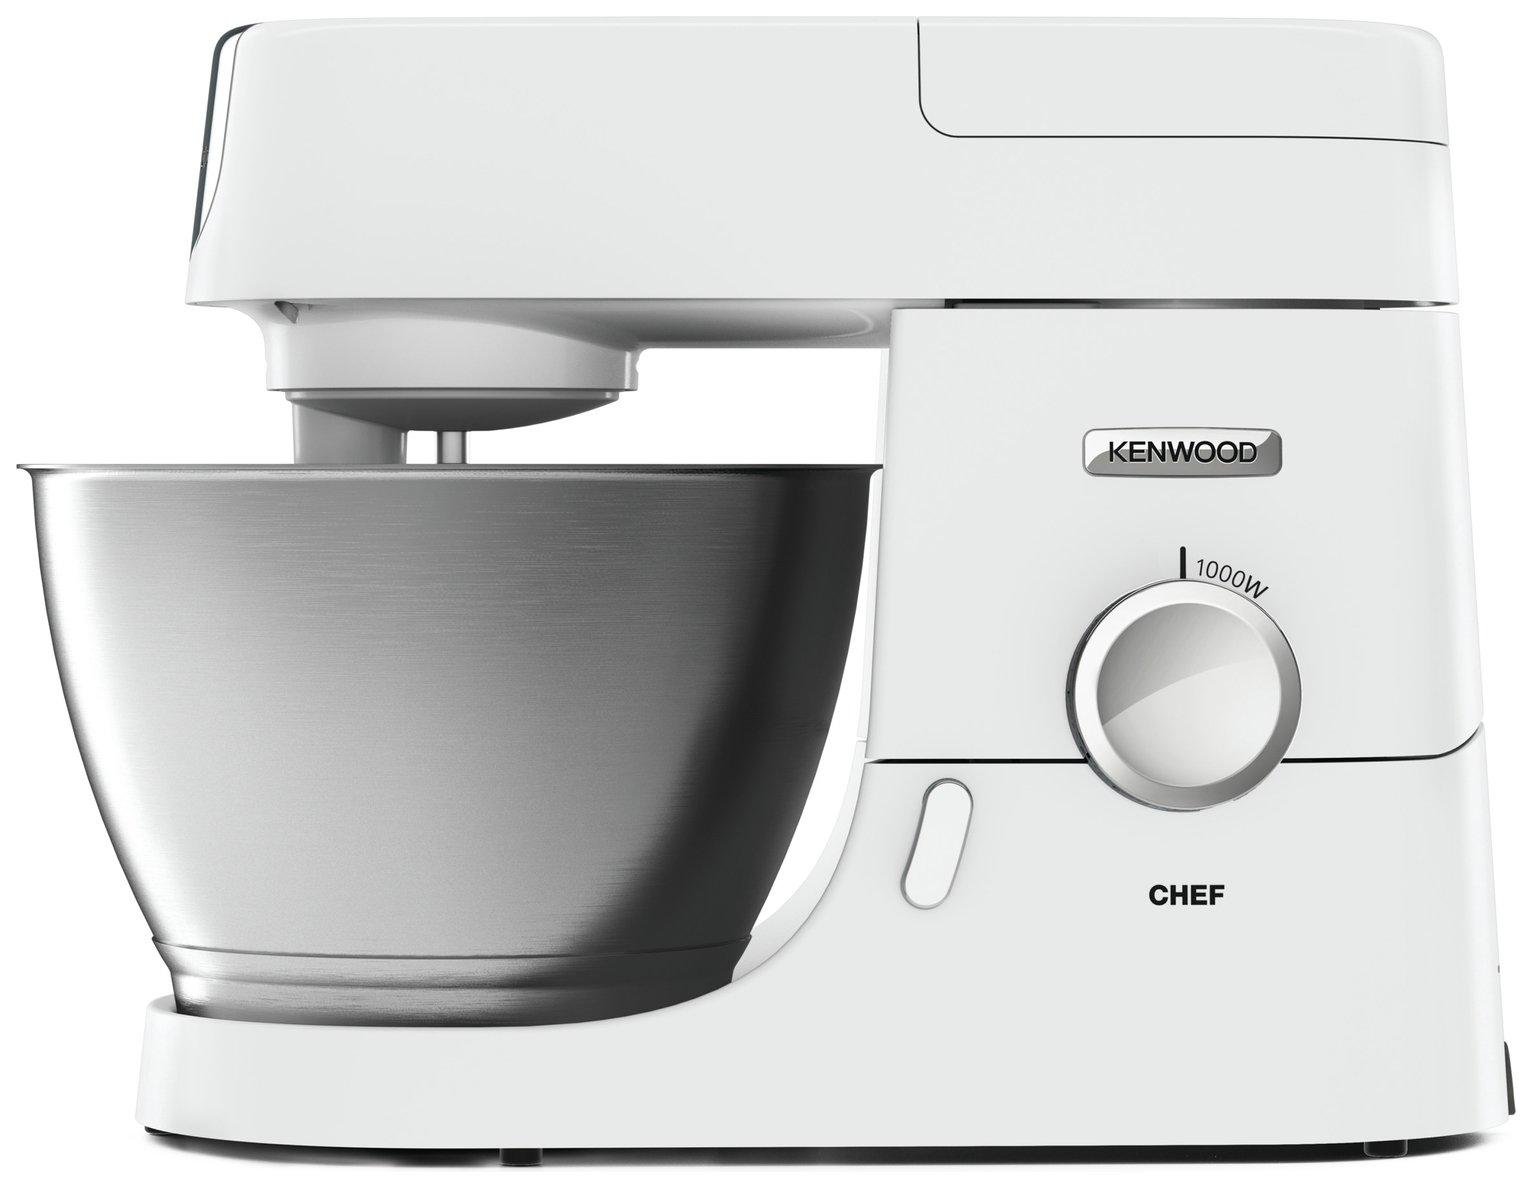 kenwood-chef-kitchen-machine-kvc3100w-stand-mixer-white